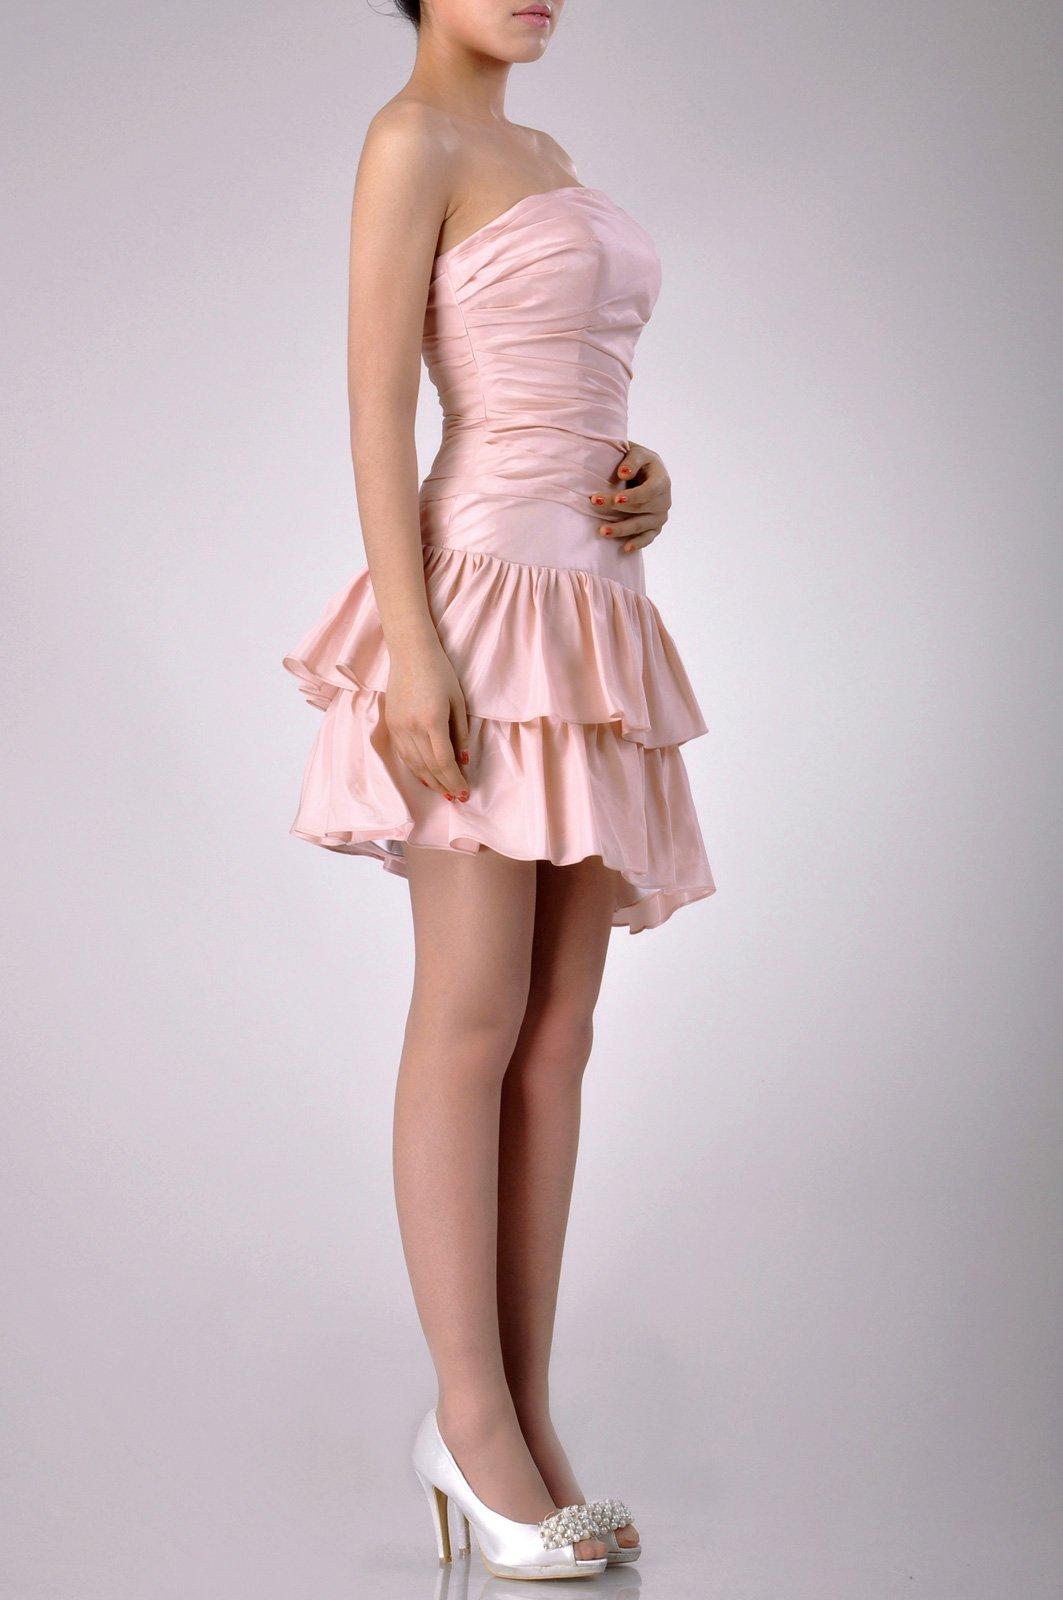 Taffeta Natrual Bateau Short Strapless Homecoming Modest Bridesmaid Dress Short, Color White,14 by Adorona (Image #5)